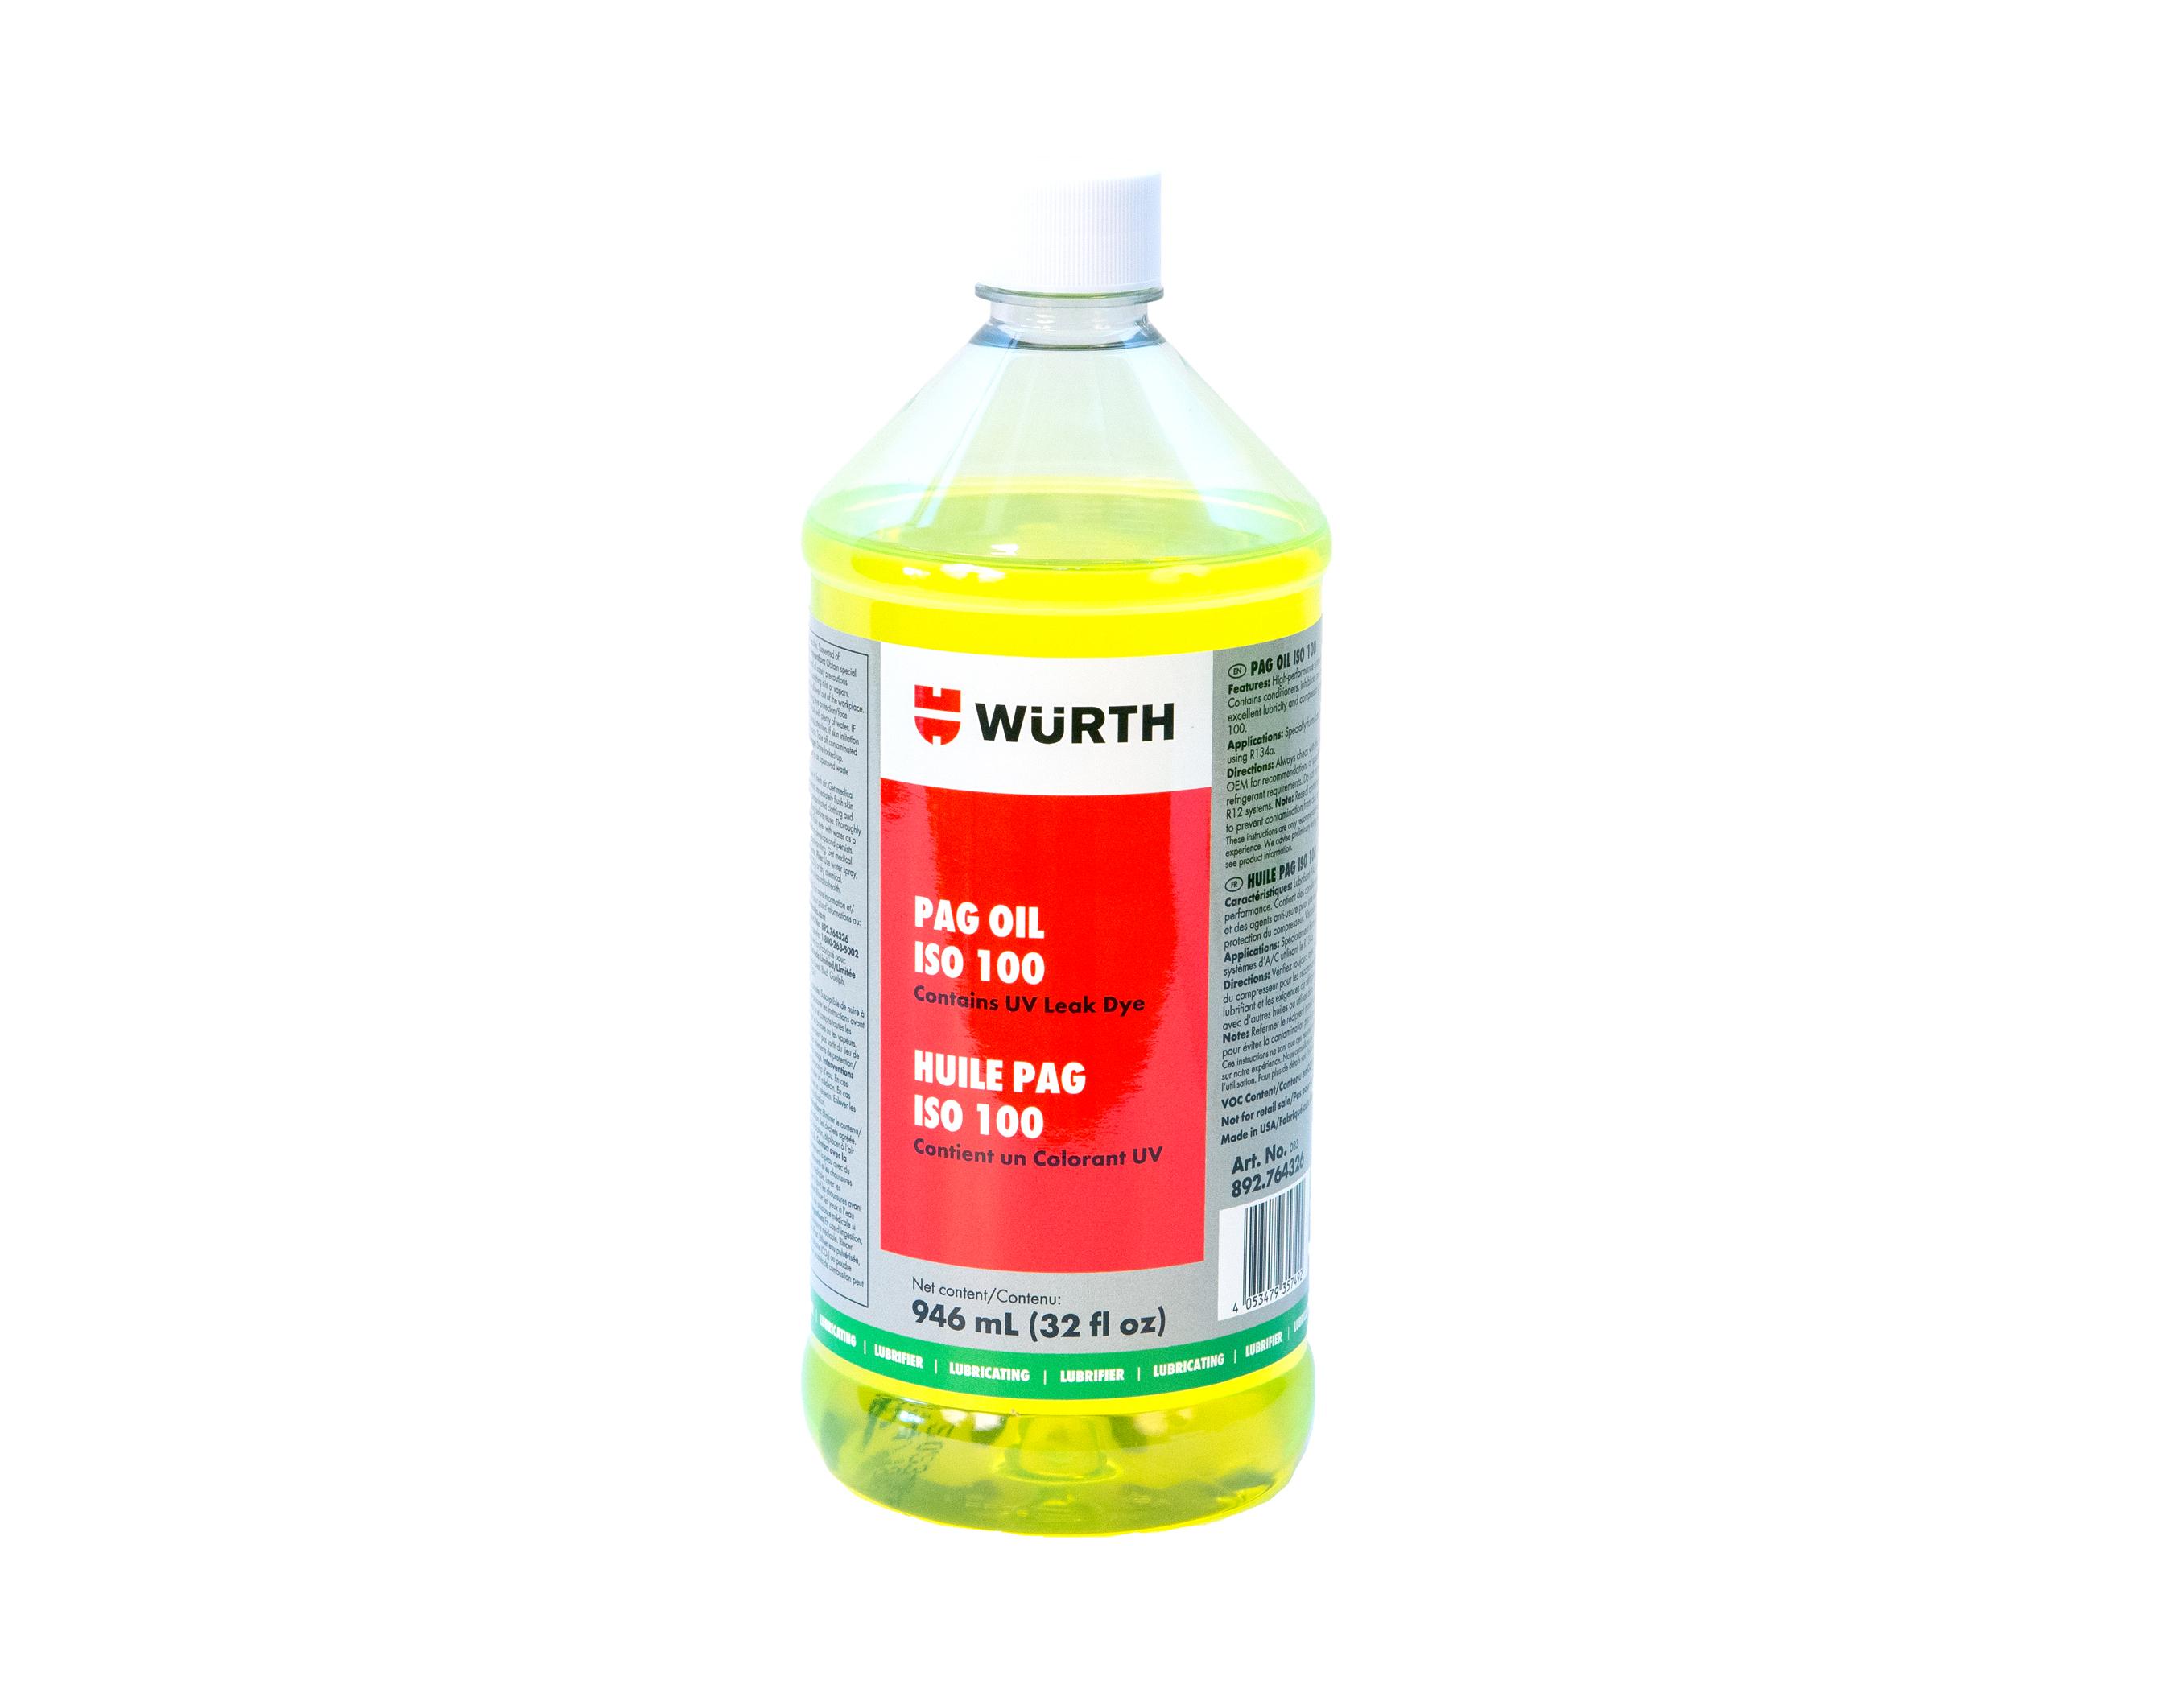 PAG OIL 100 VISC 946 ML (32OZ)